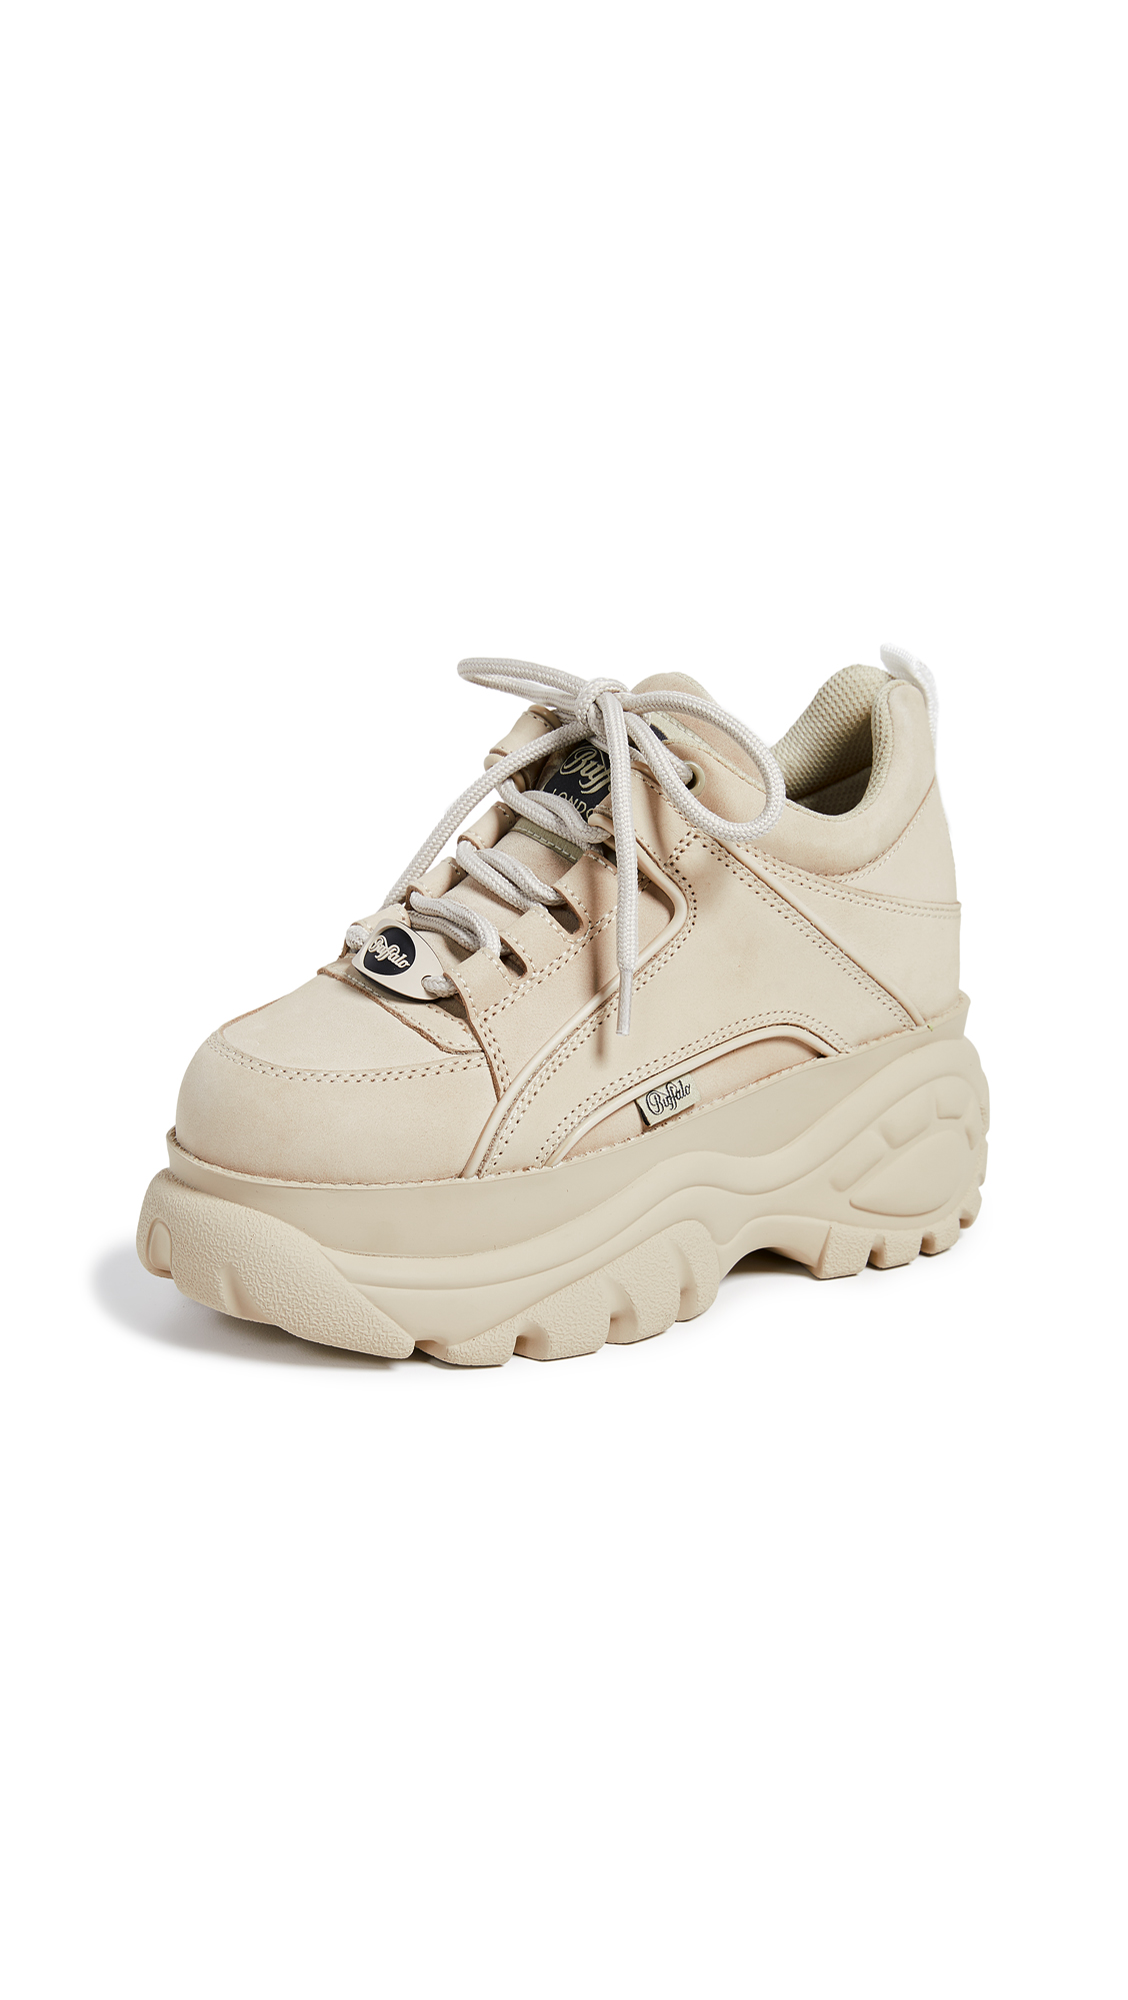 Buffalo London Classic Kicks Sneakers - Cream